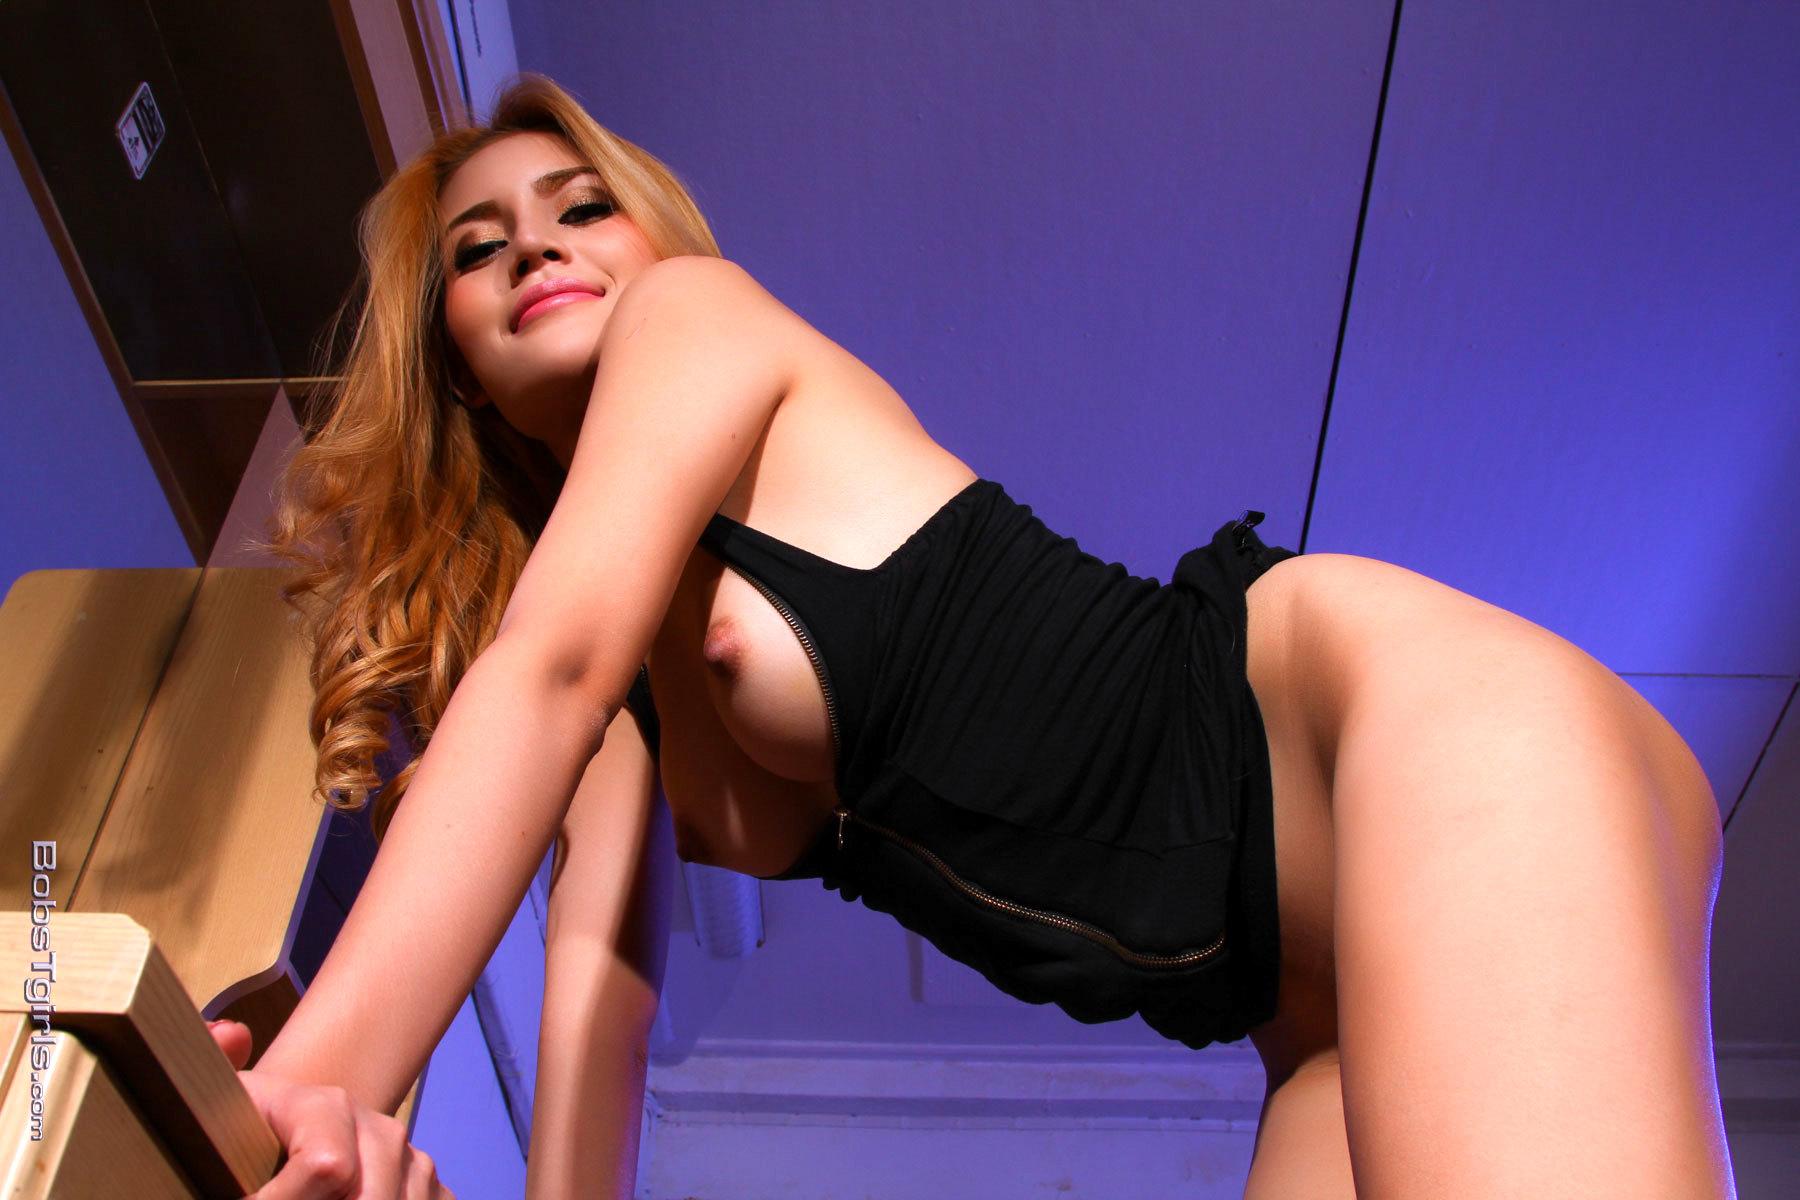 Flirtatious Honey Stroking Her Enormous Penis